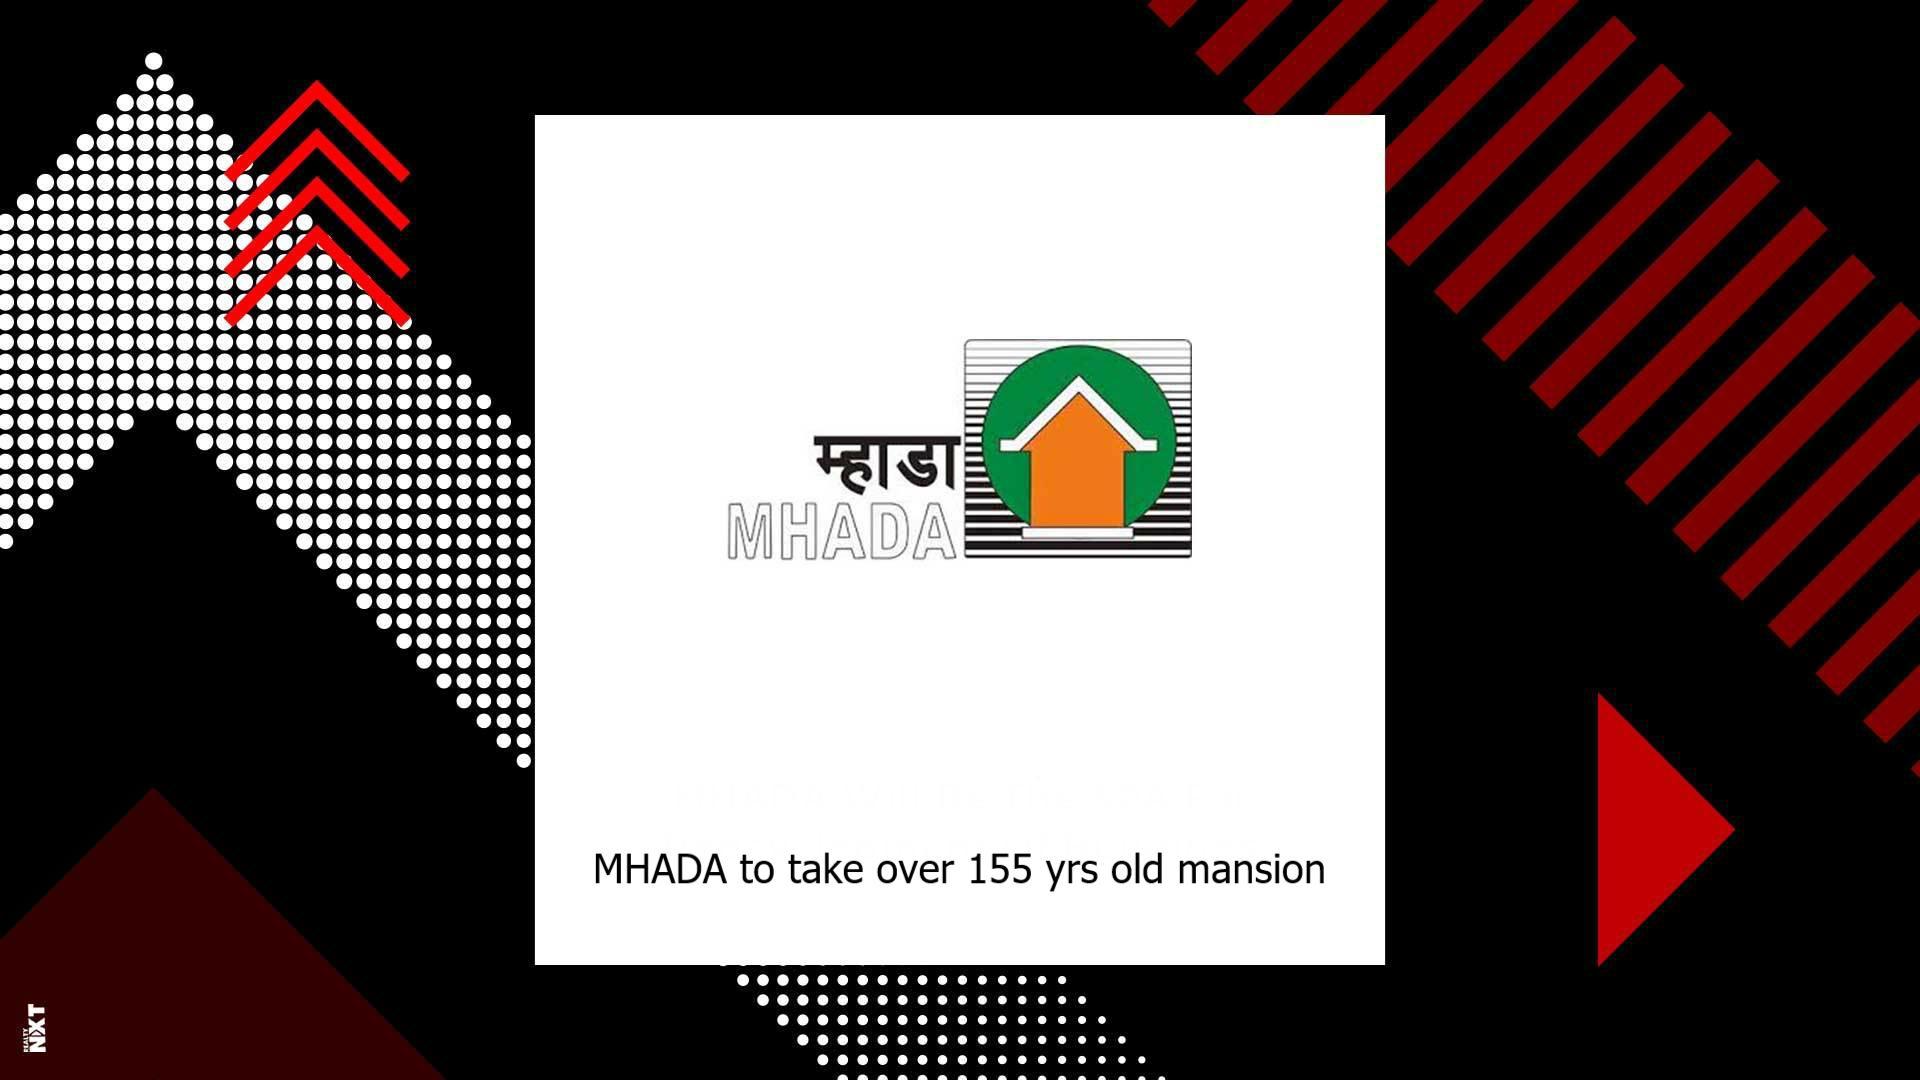 Maharashtra government directs MHADA to take over Esplanade Mansion